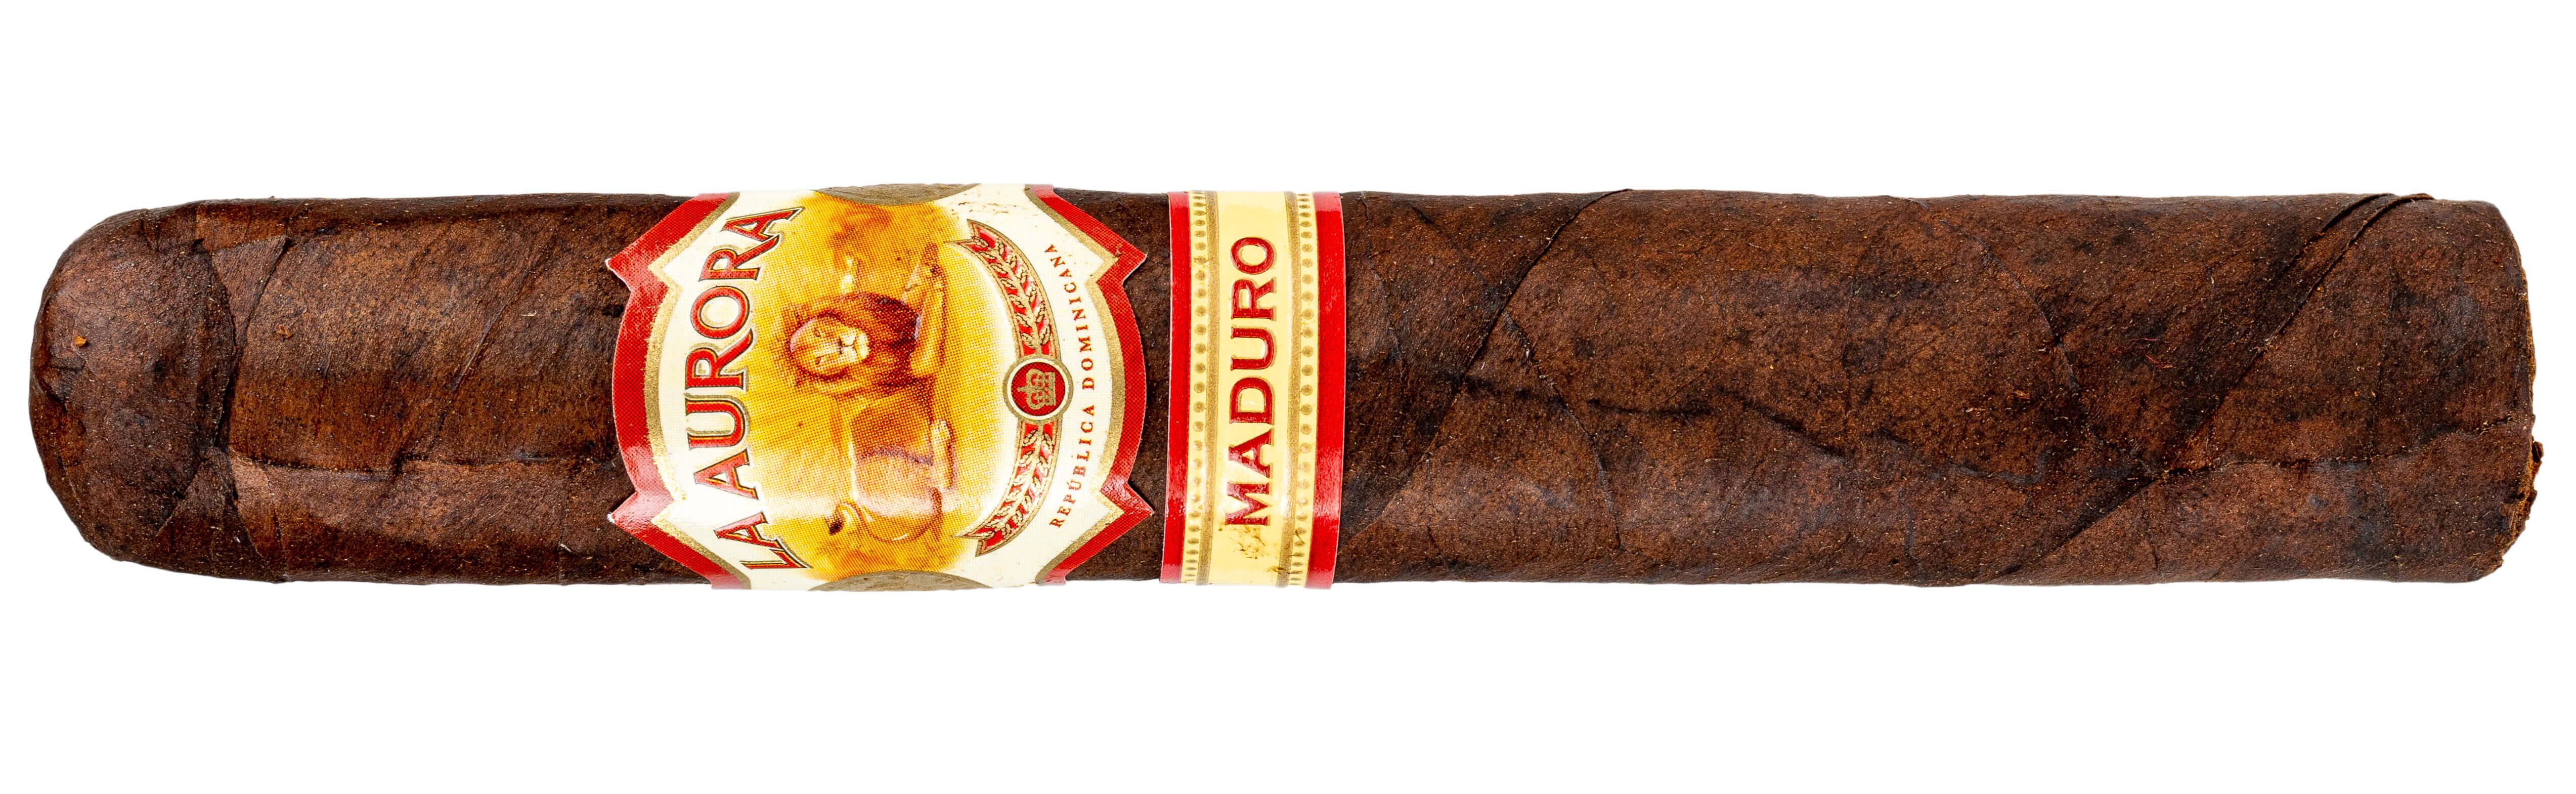 Blind Cigar Review: La Aurora | 1985 Maduro Robusto